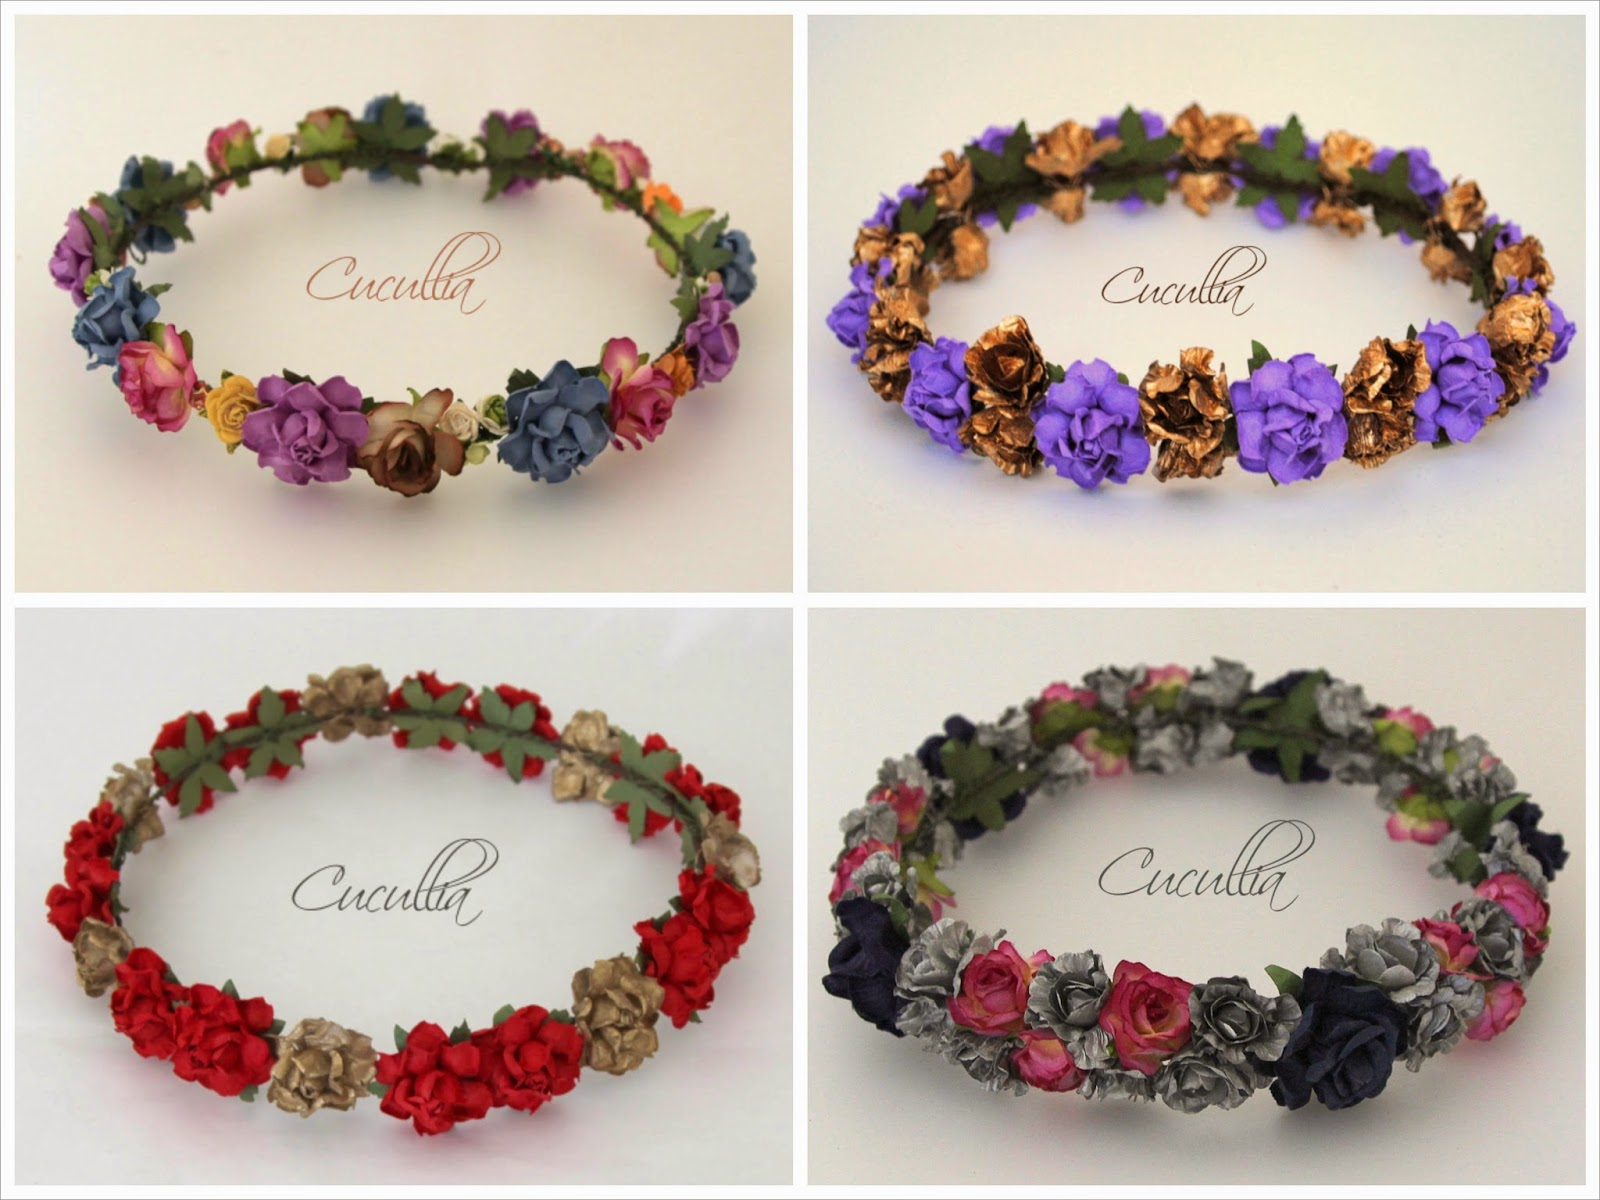 Coronas de flores y turbantes by Cucullia Sweet Bodas